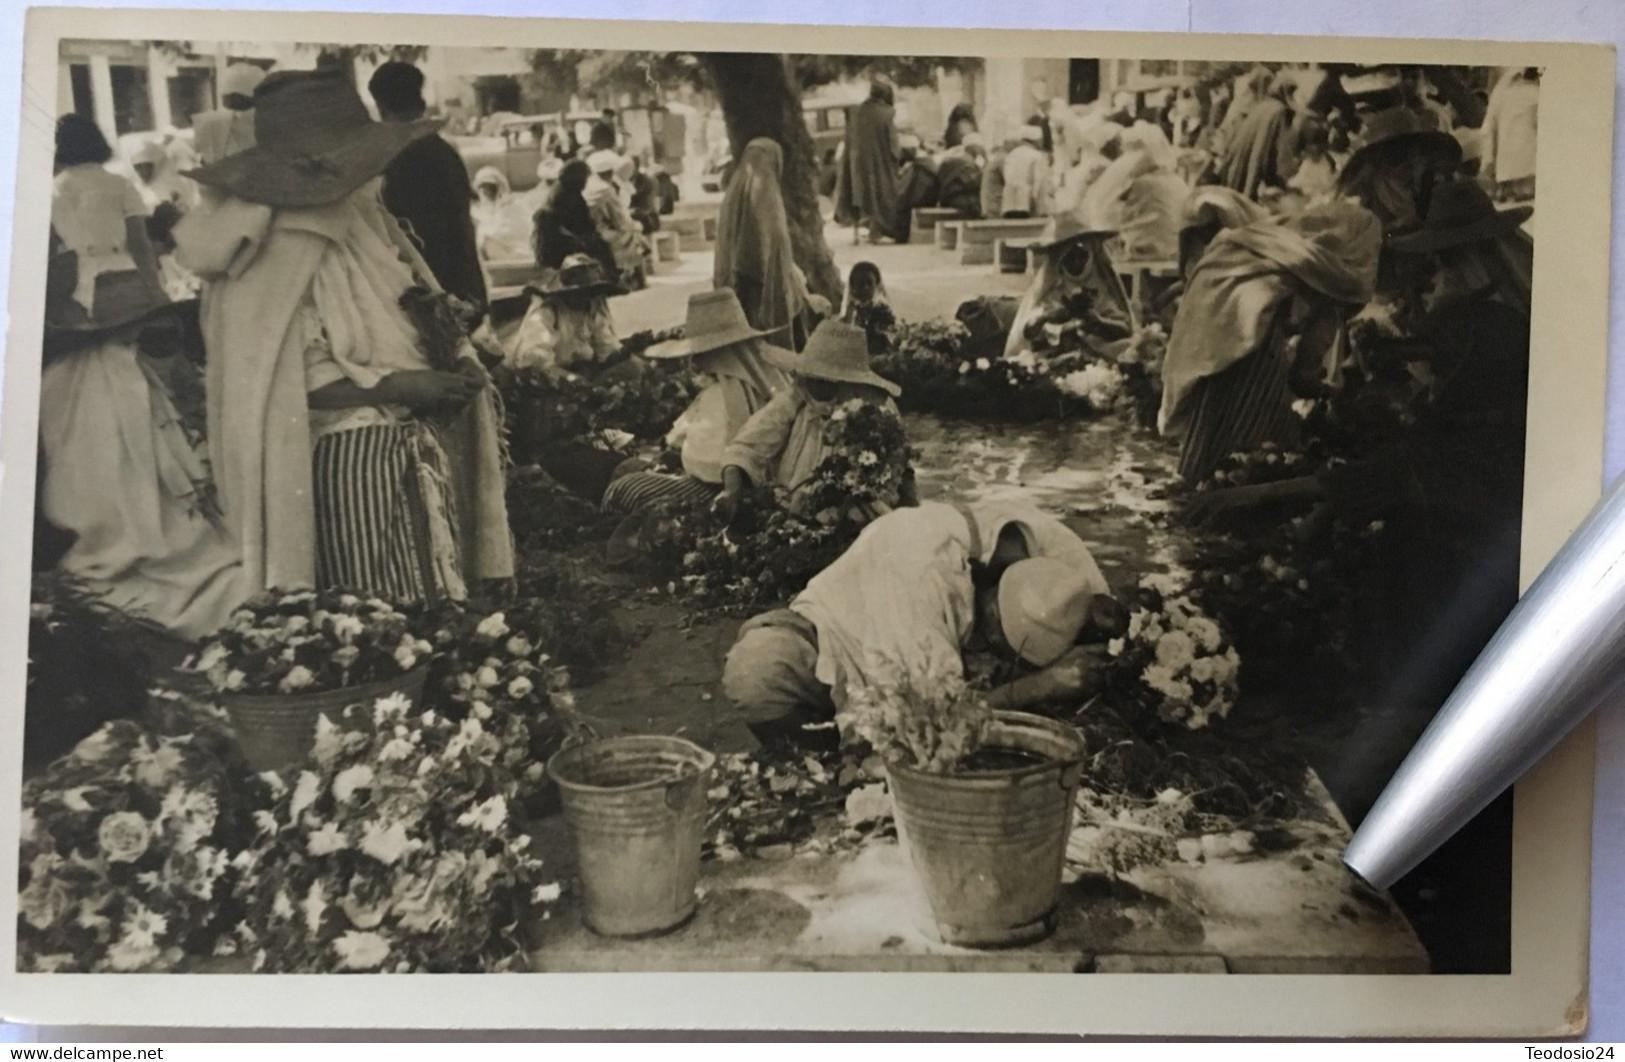 Marruecos 1948 - Marruecos